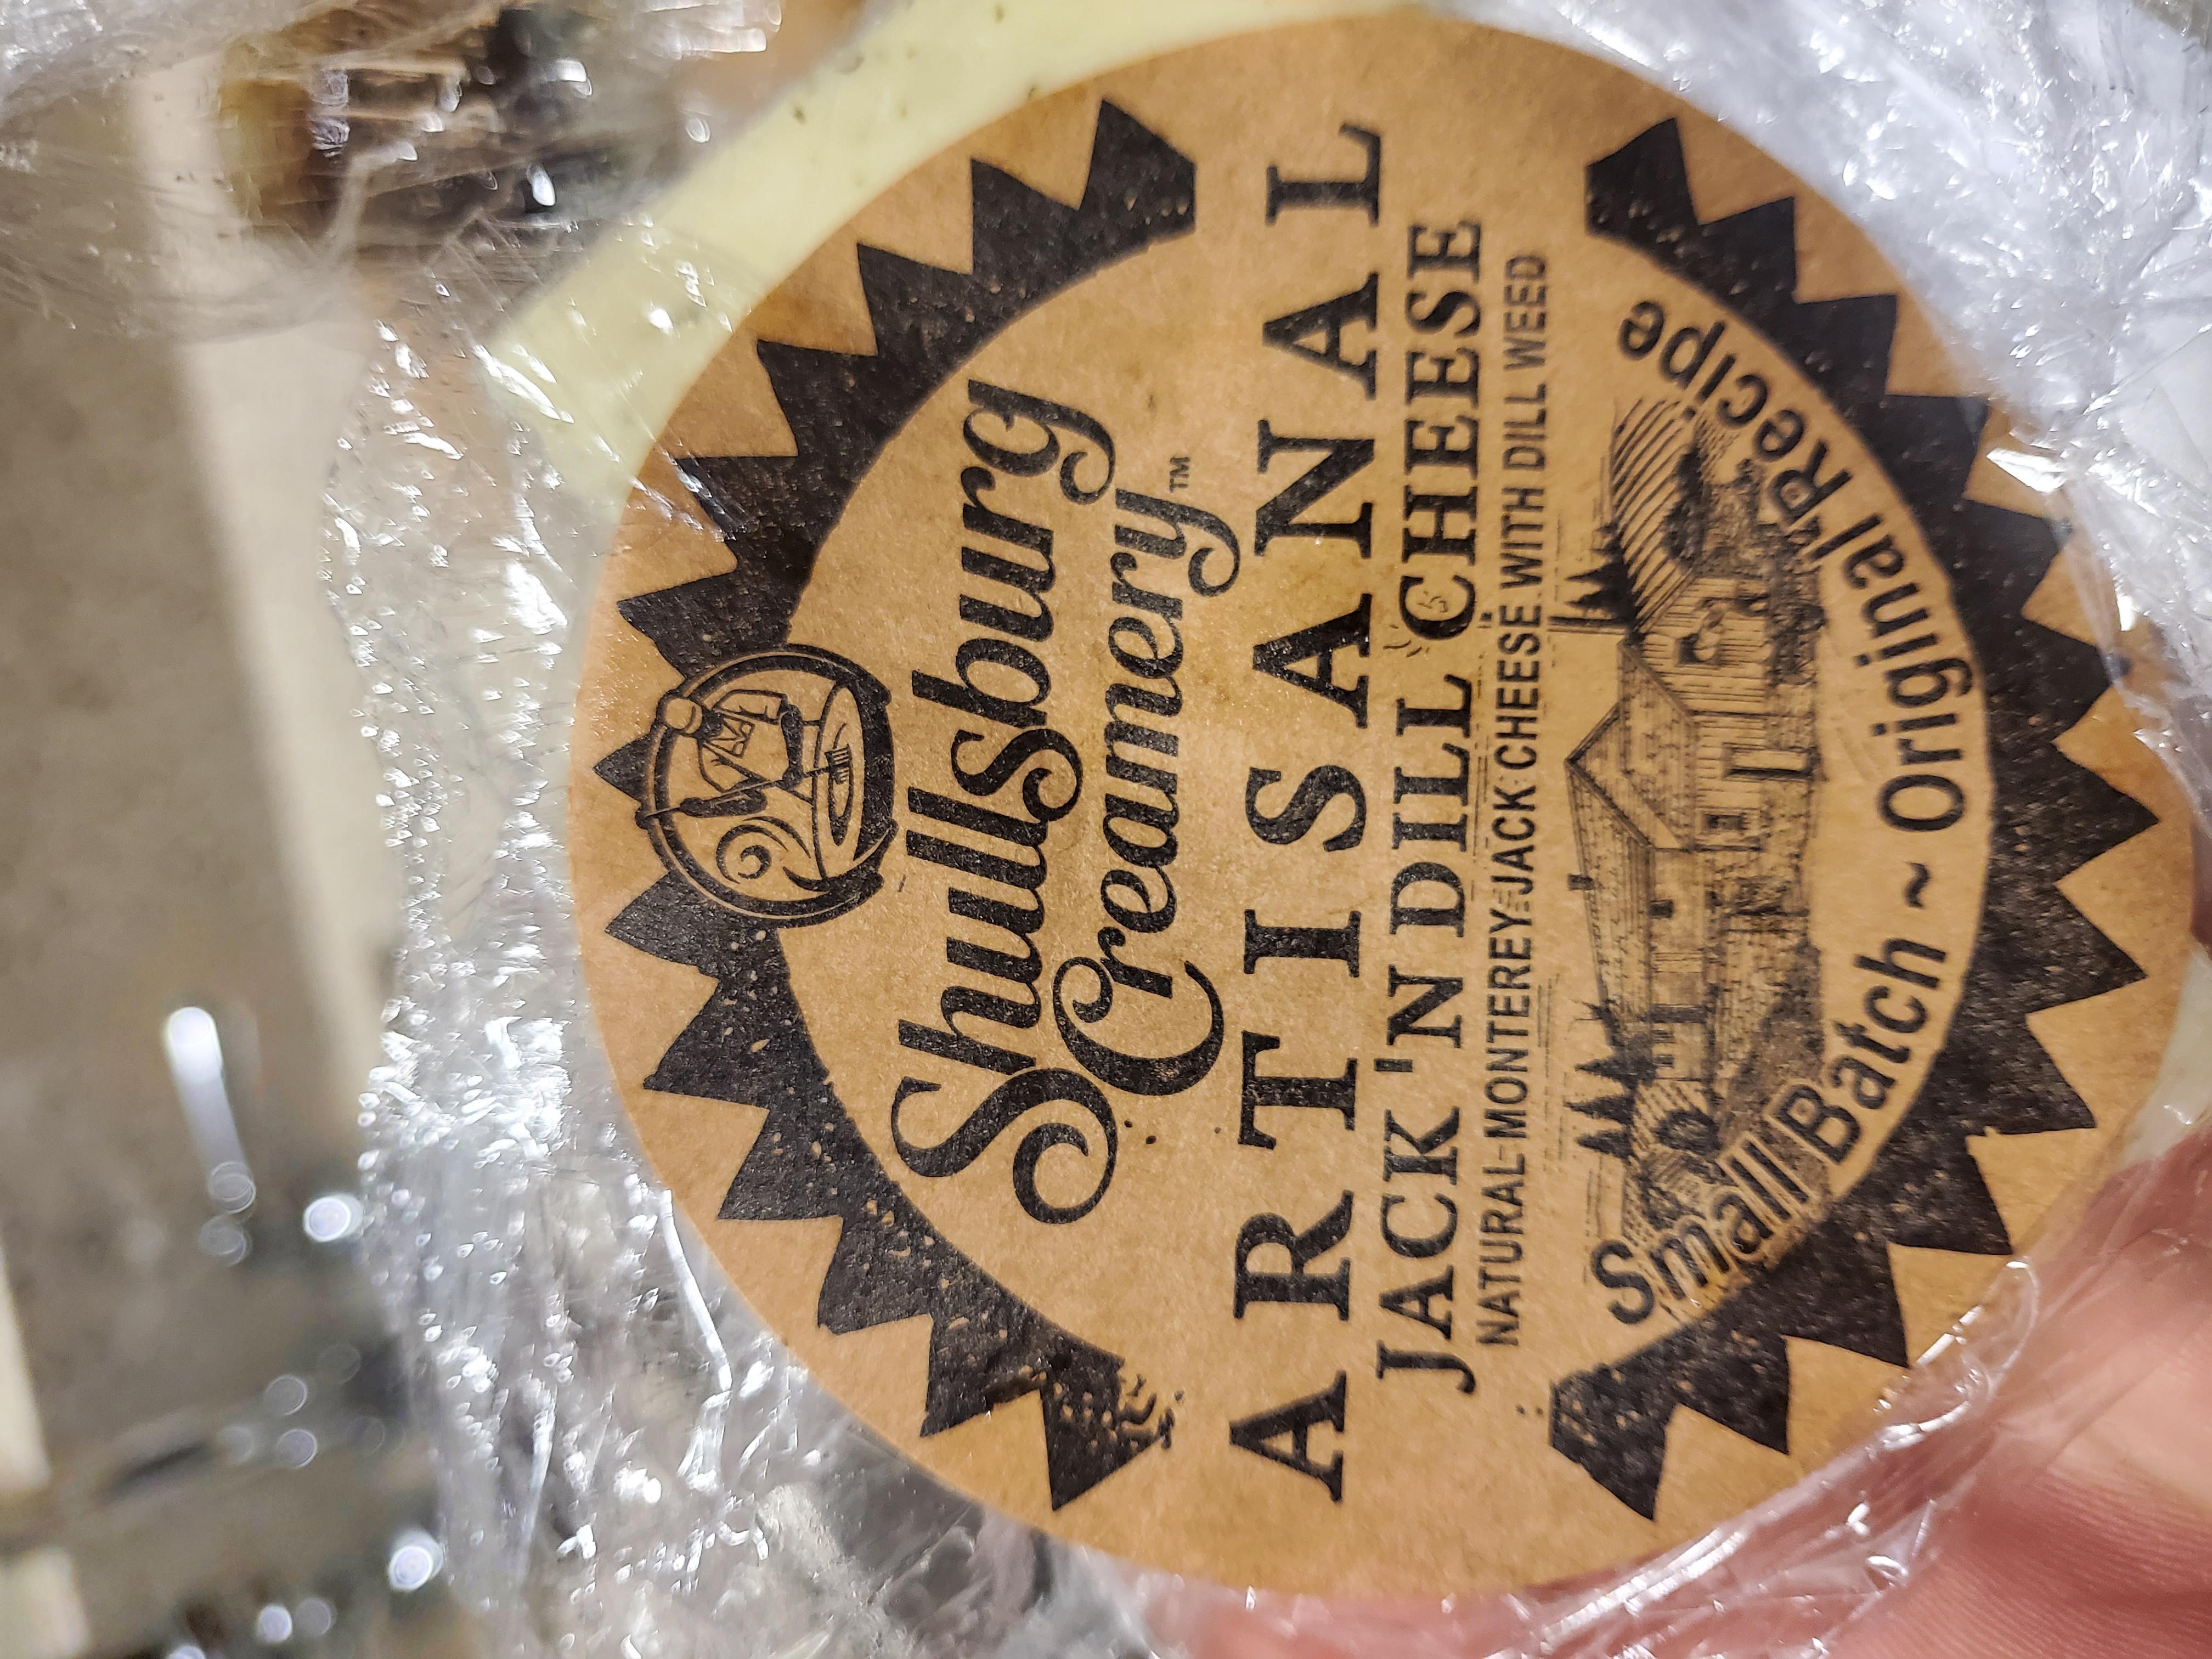 Artisanal Jack N Dill Cheese